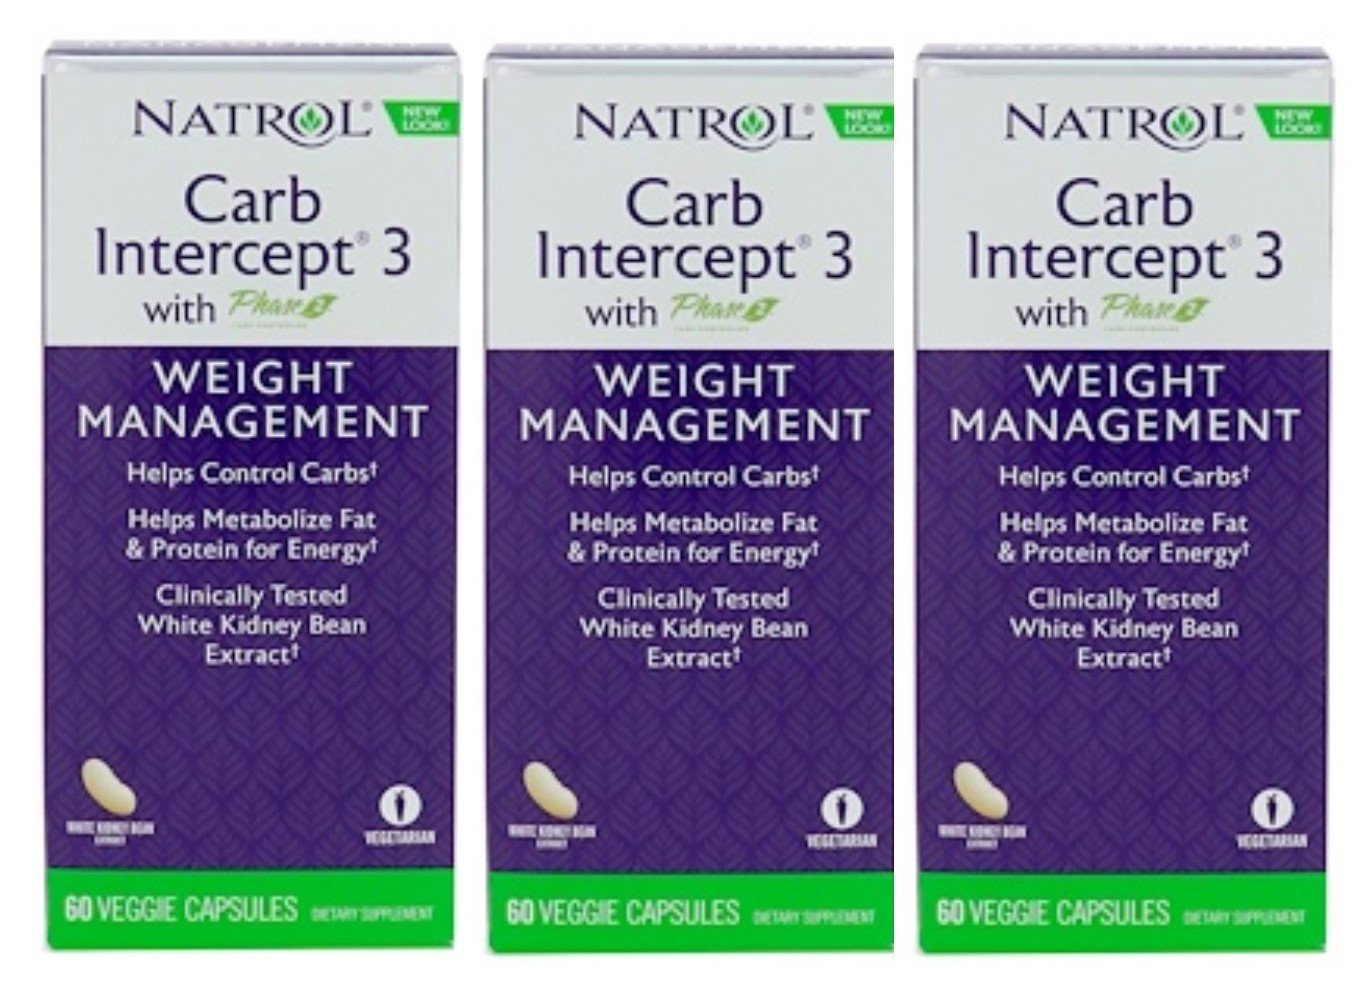 Natrol Carb Intercept 3 Capsules, 60-Count (Pack of 3)